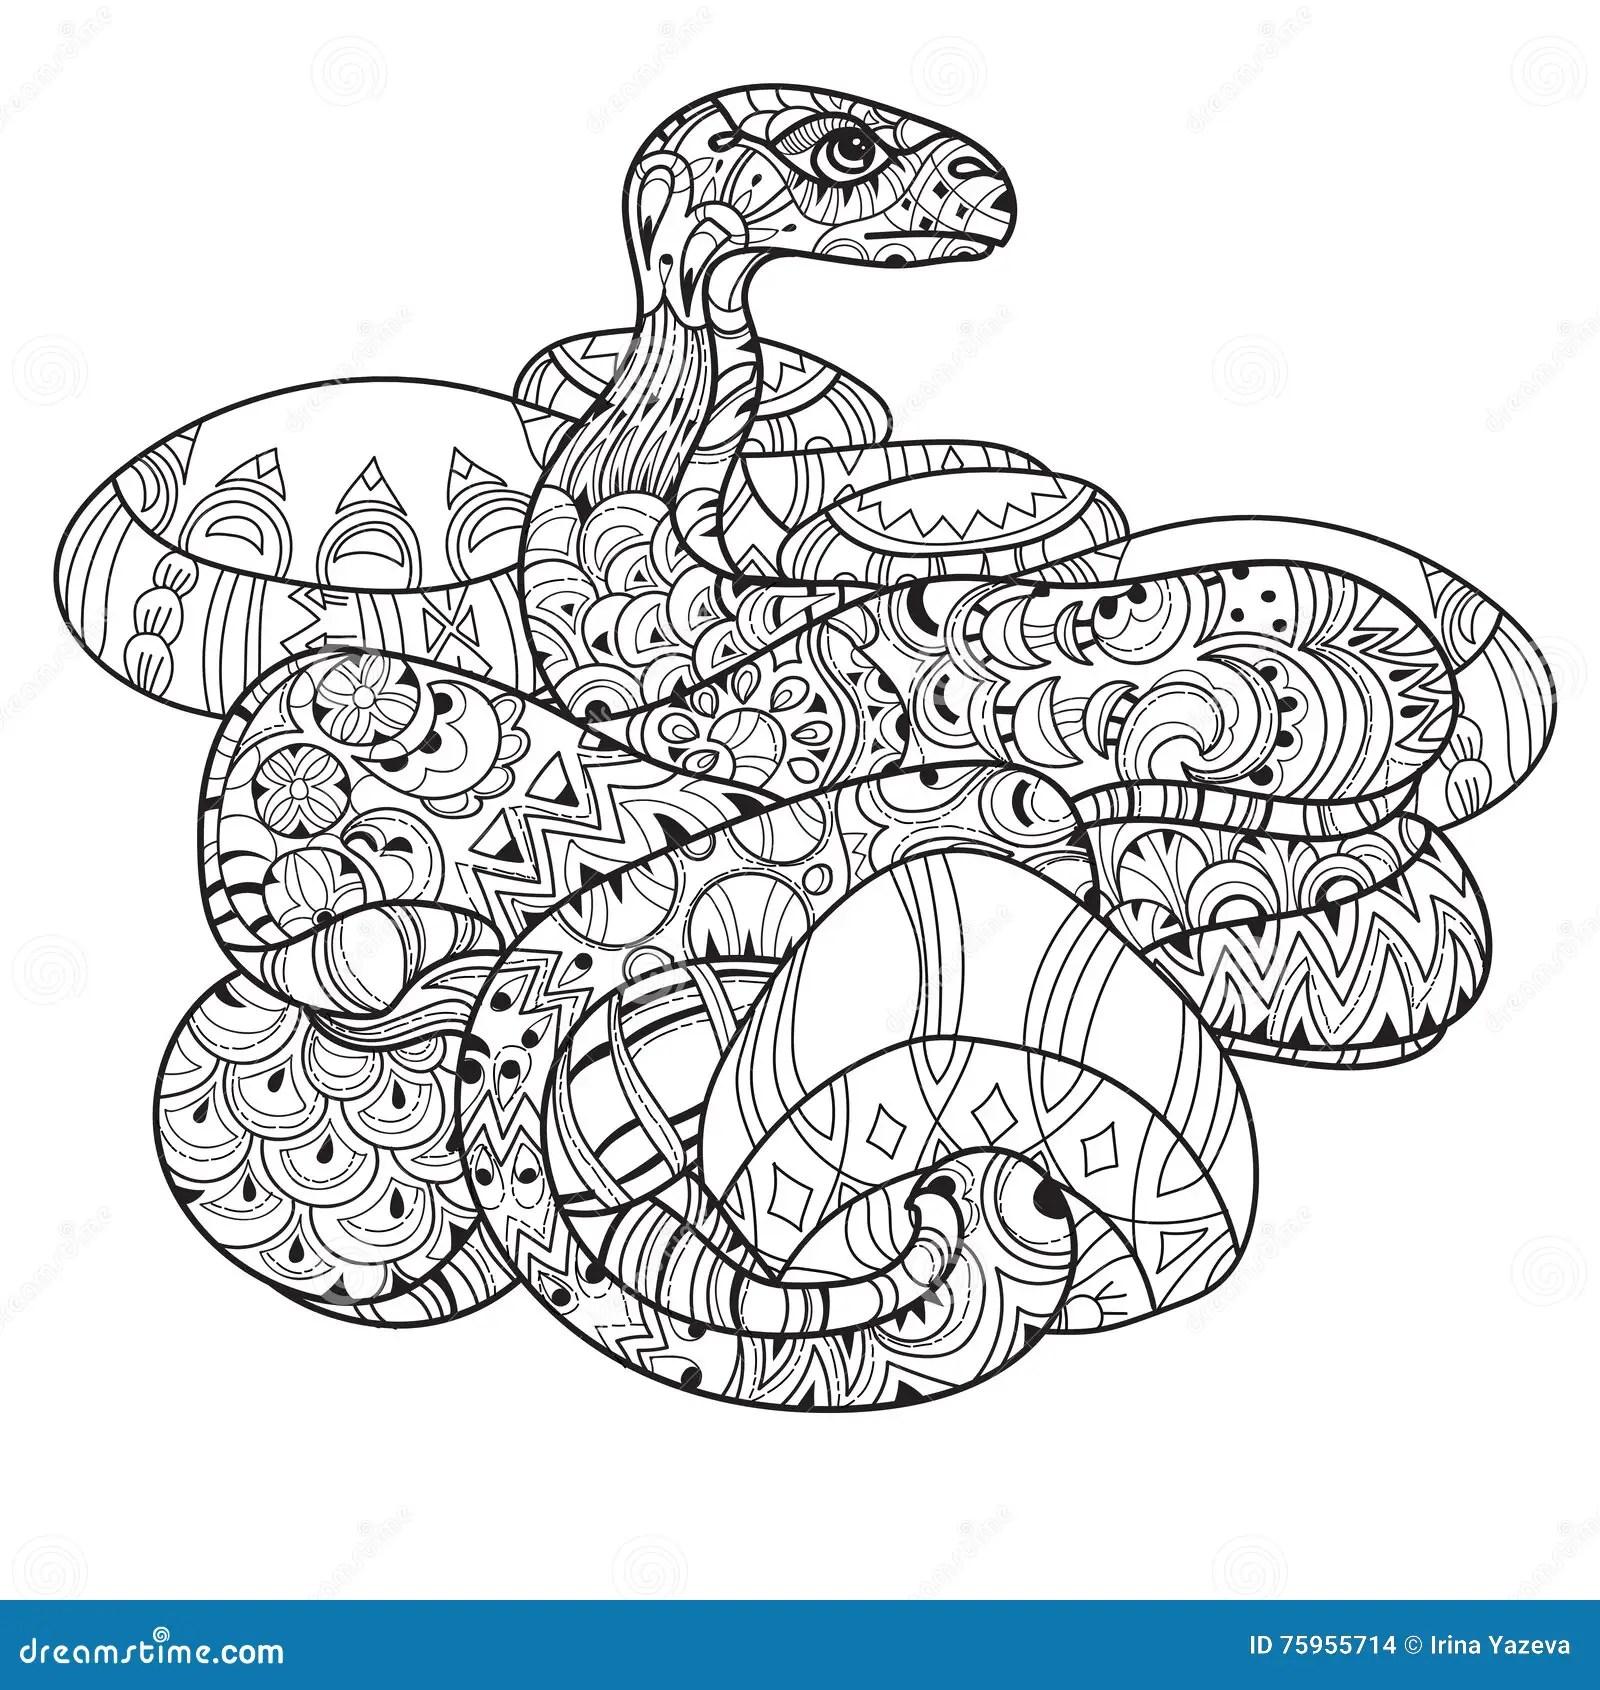 Serpent Cartoons, Illustrations & Vector Stock Images